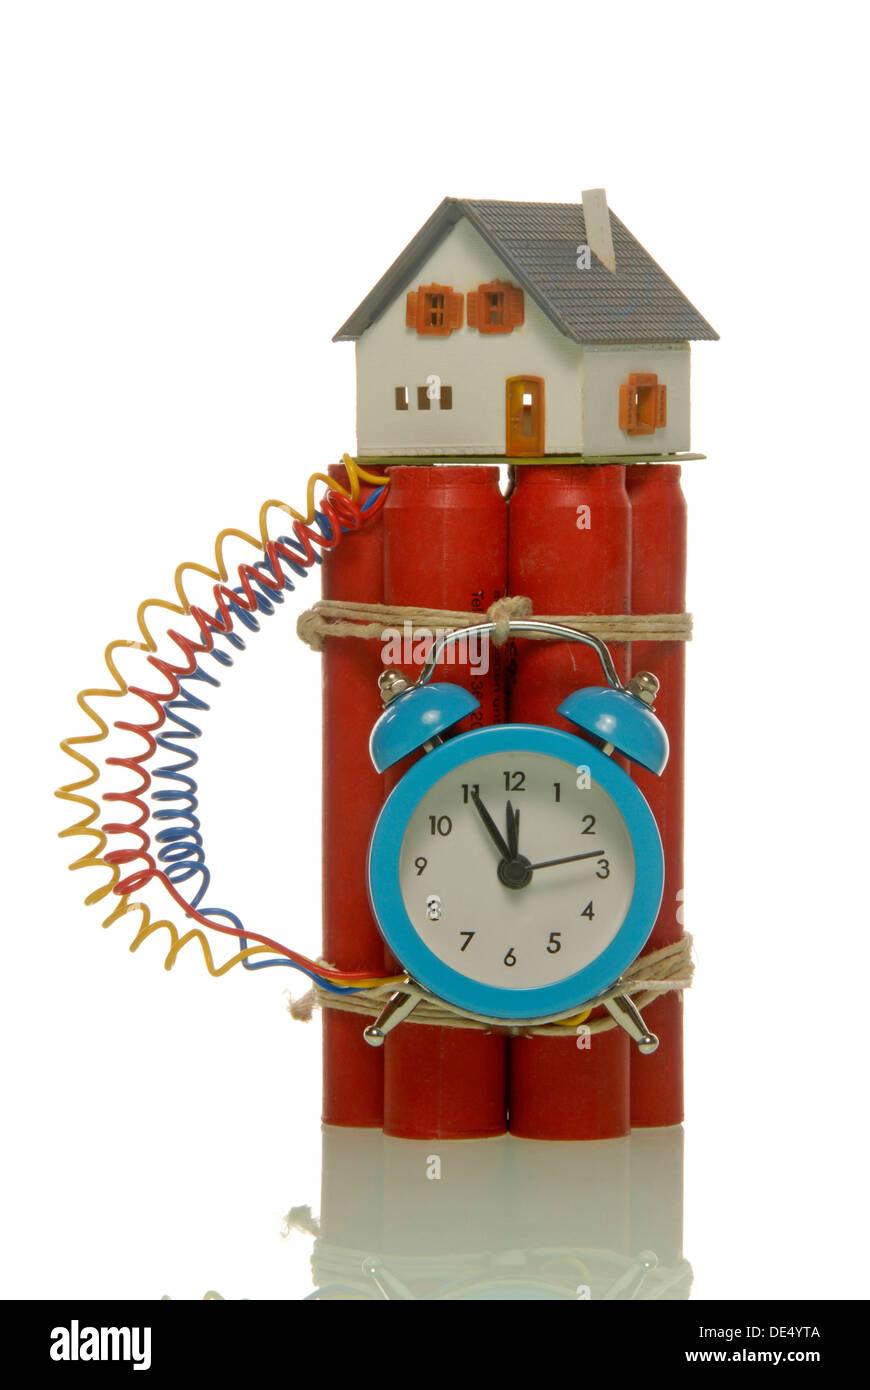 Miniature house on a bomb, symbolic image of a hazardous housing market - Stock Image